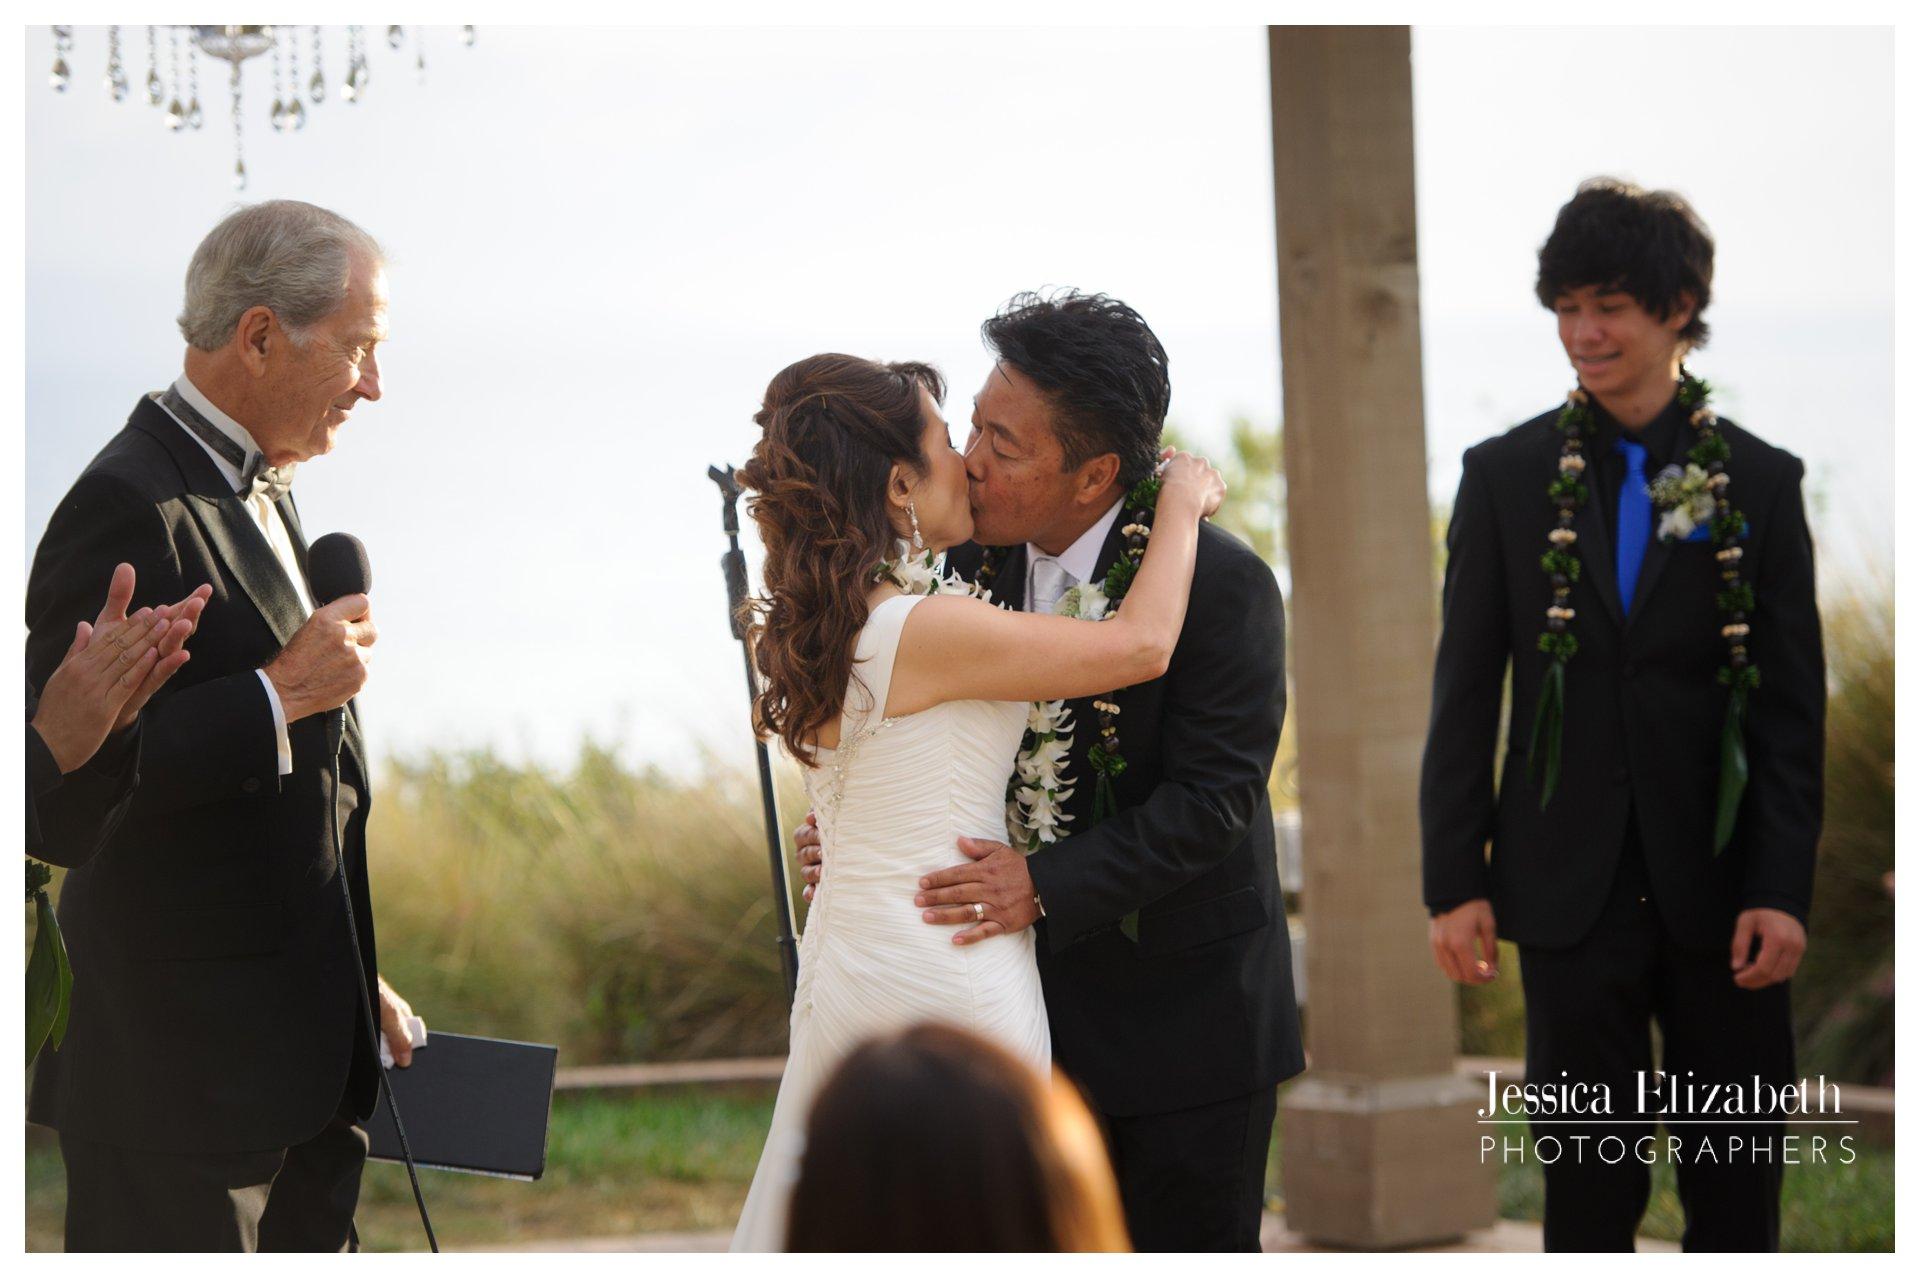 24-Terranea-Palos-Verdes-Wedding-Photography-by-Jessica-Elizabeth-w.jpg